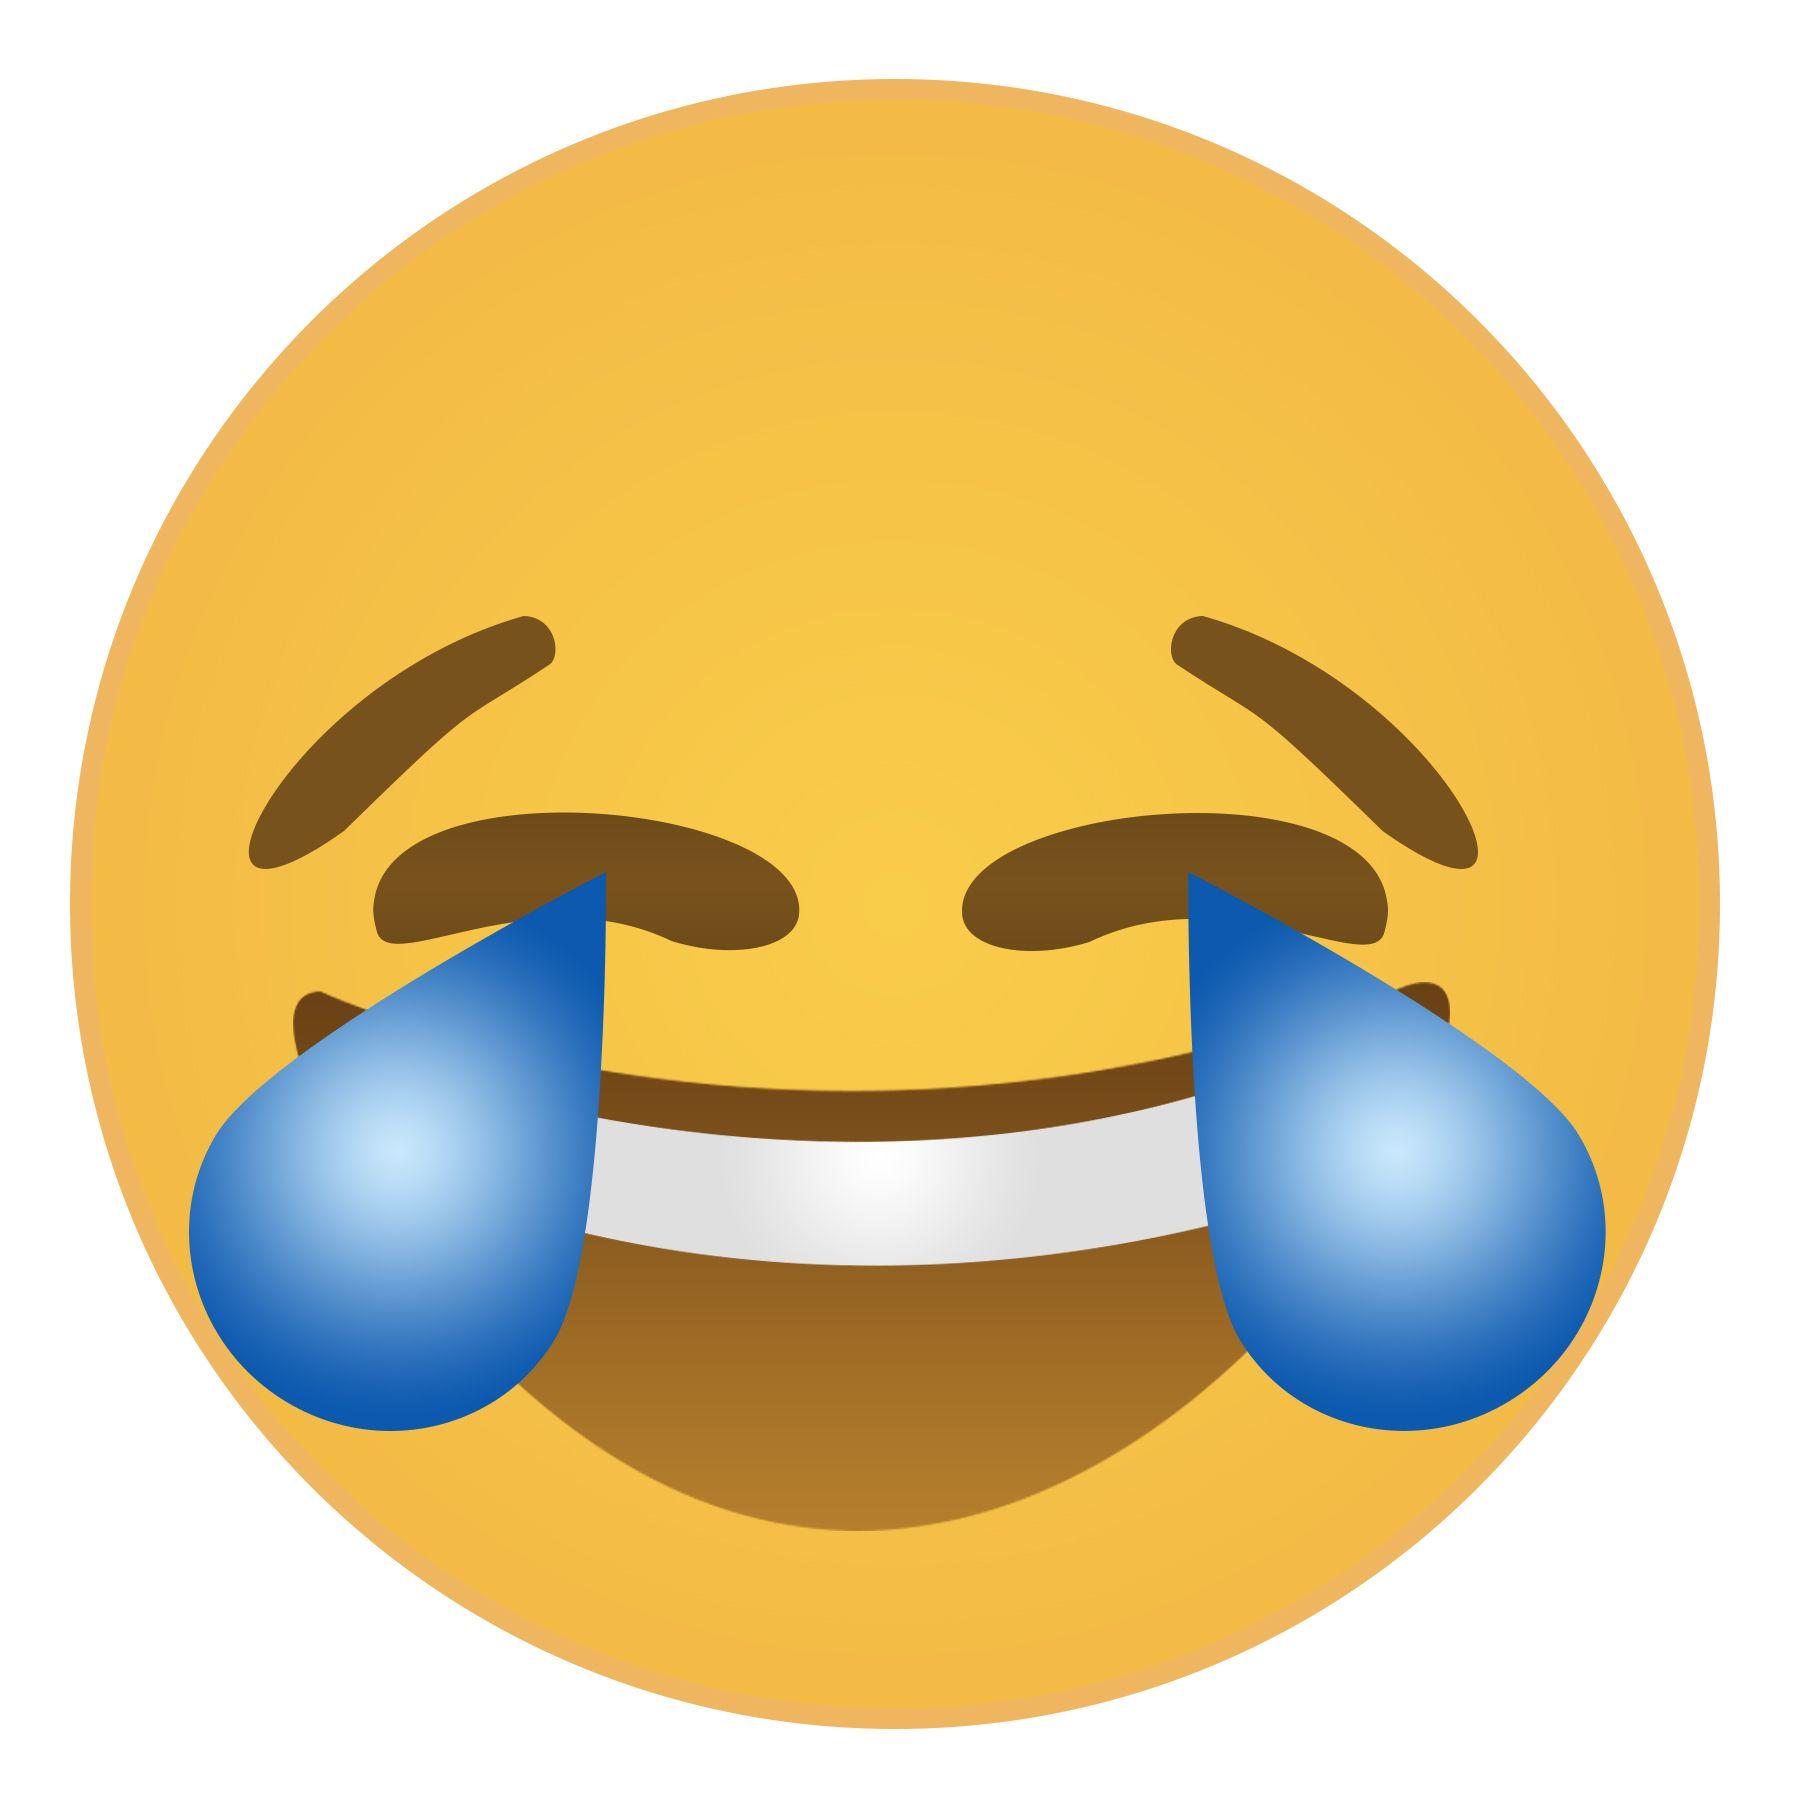 Emoji Laughing Tears Face Free Printable 2 1 800 1 800